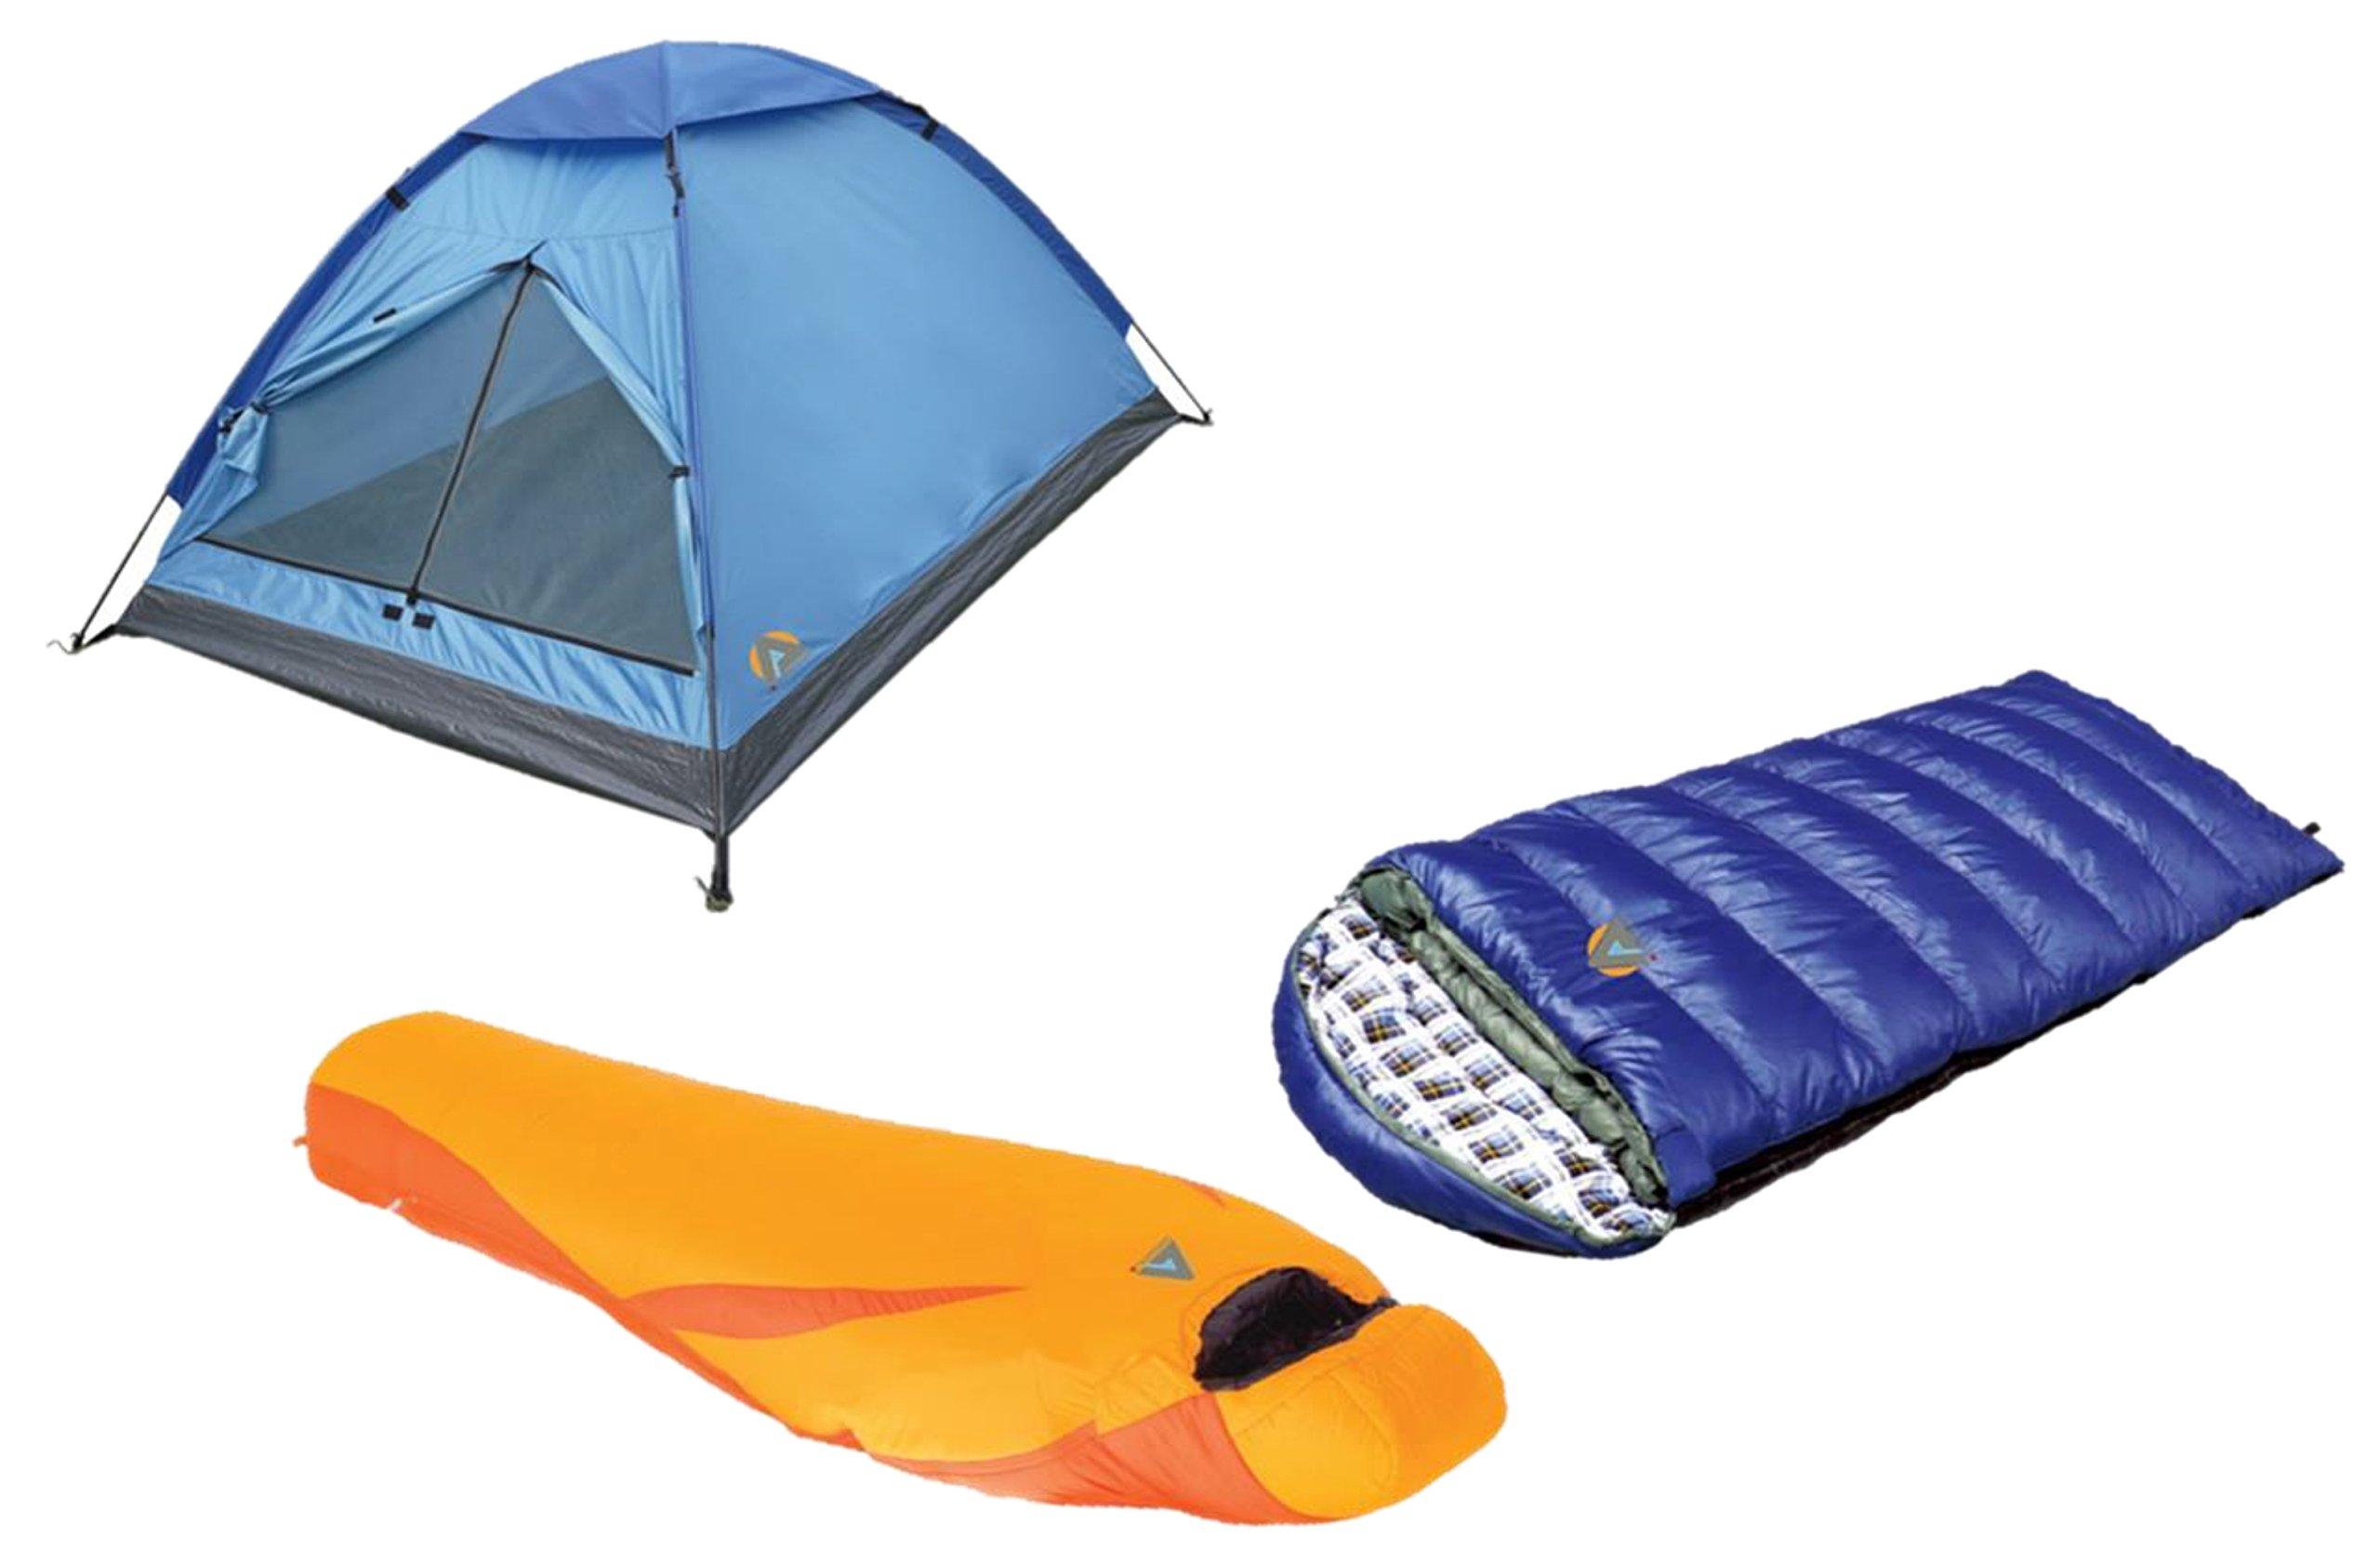 Alpinizmo-High-Peak-USA-Kodiak-0F-Latitude-20F-Sleeping-Monodome-3-Tent-Combo-Set-BlueOrange-One-Size